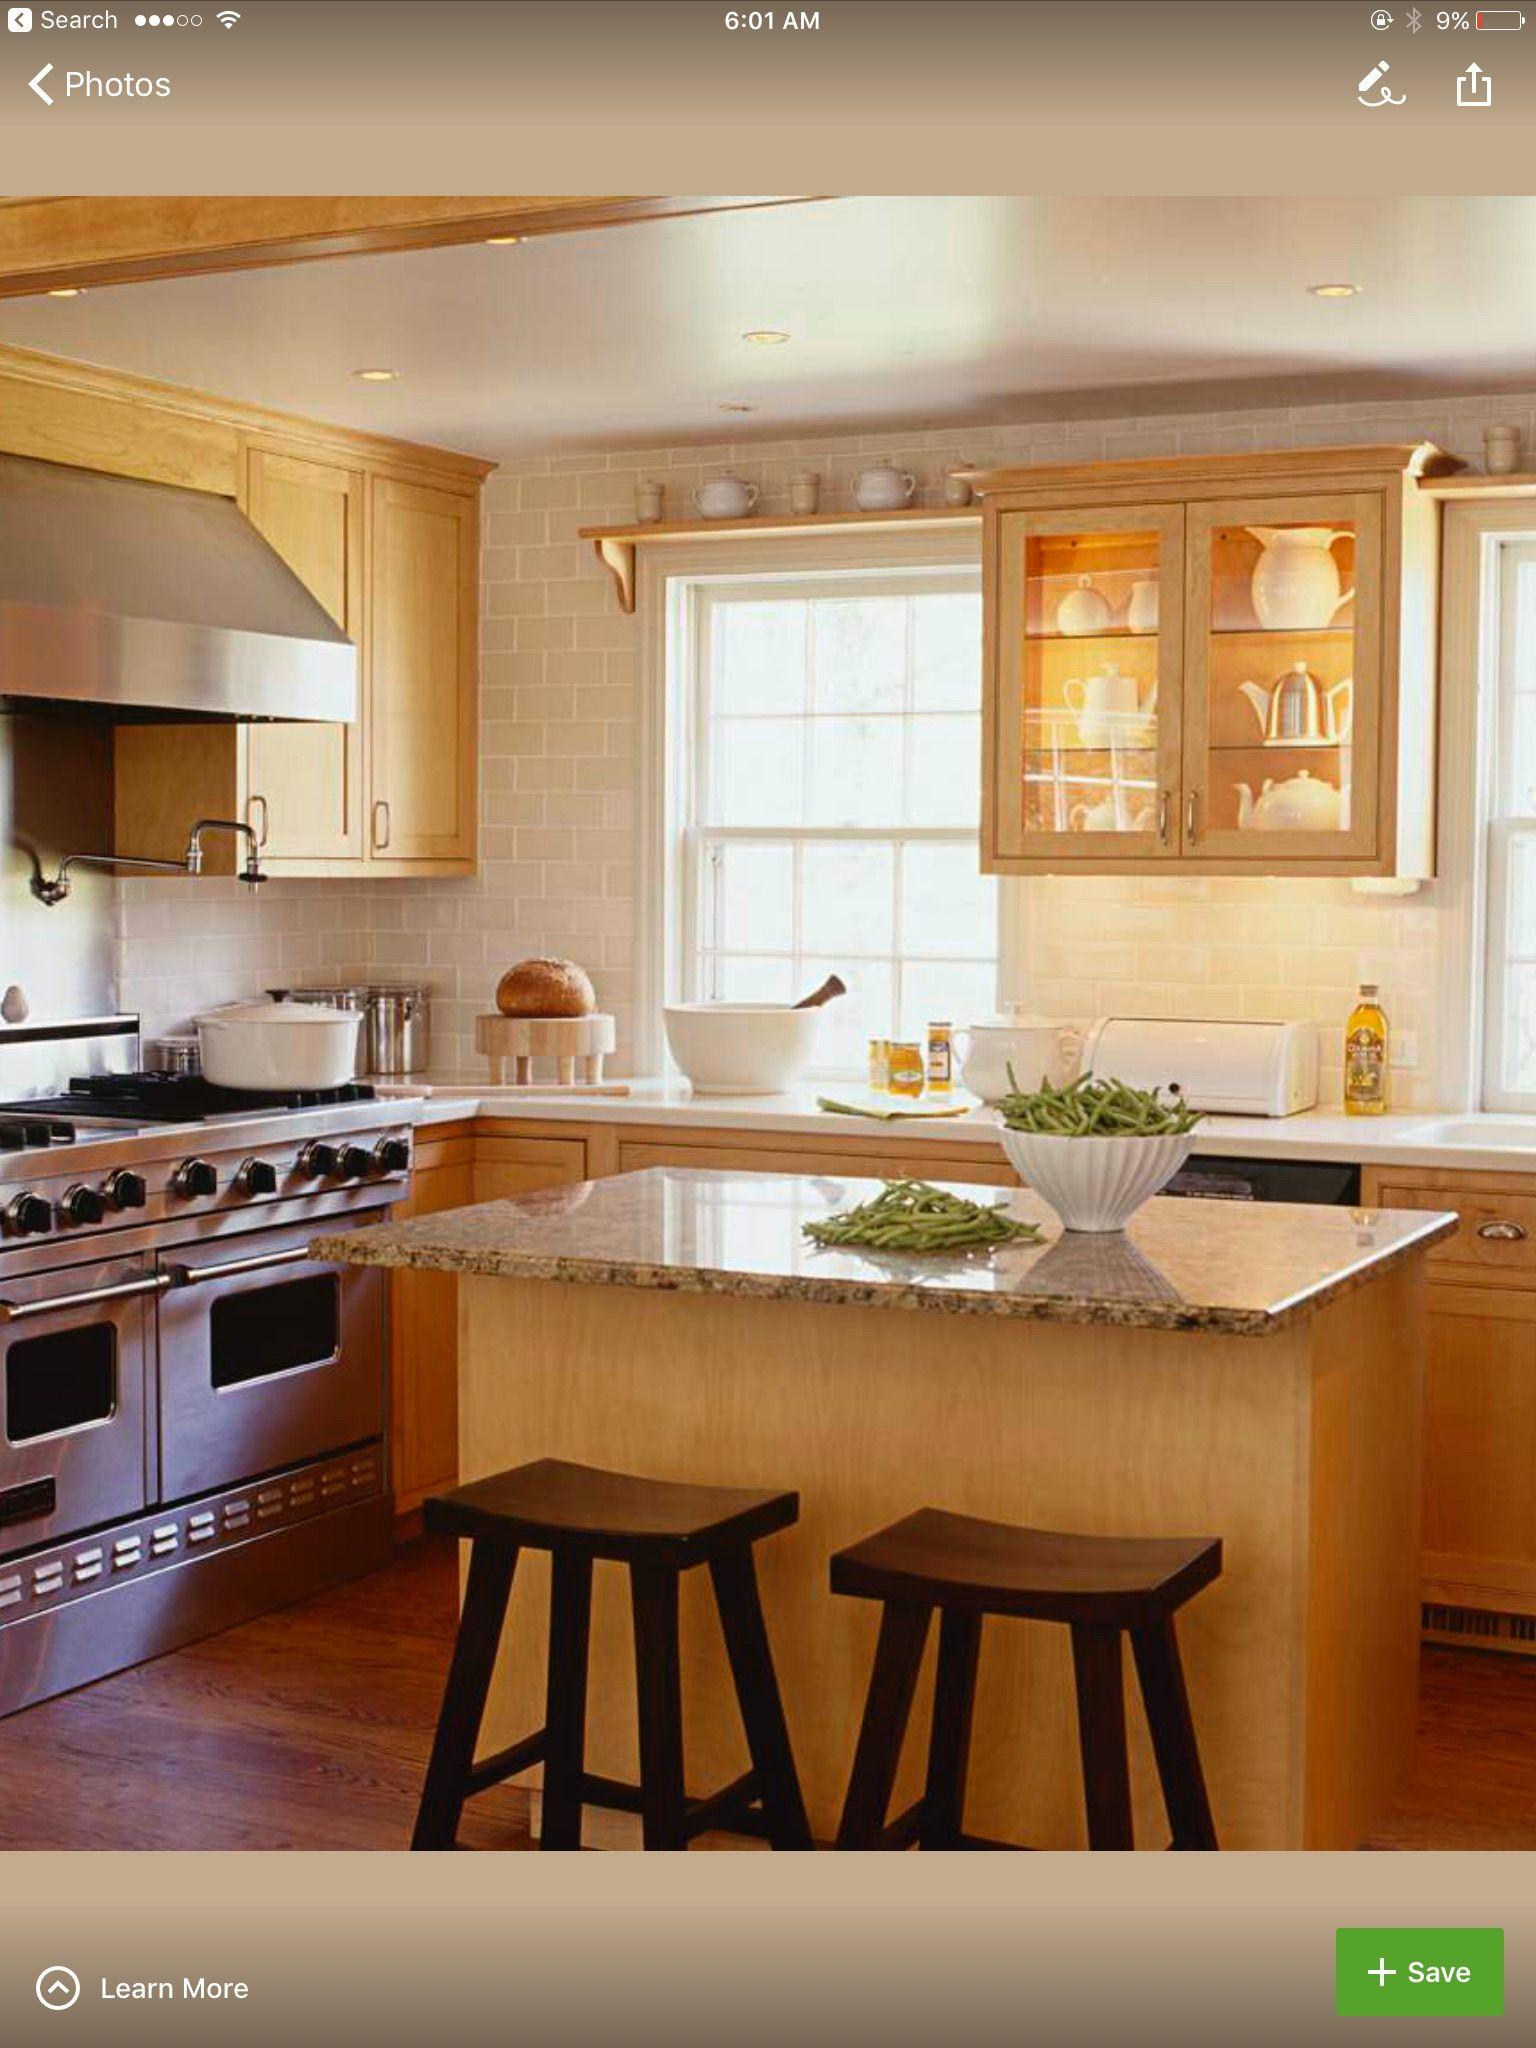 Backsplash around kitchen window  pin by lindsay fairfield herbert on kitchens  pinterest  kitchens